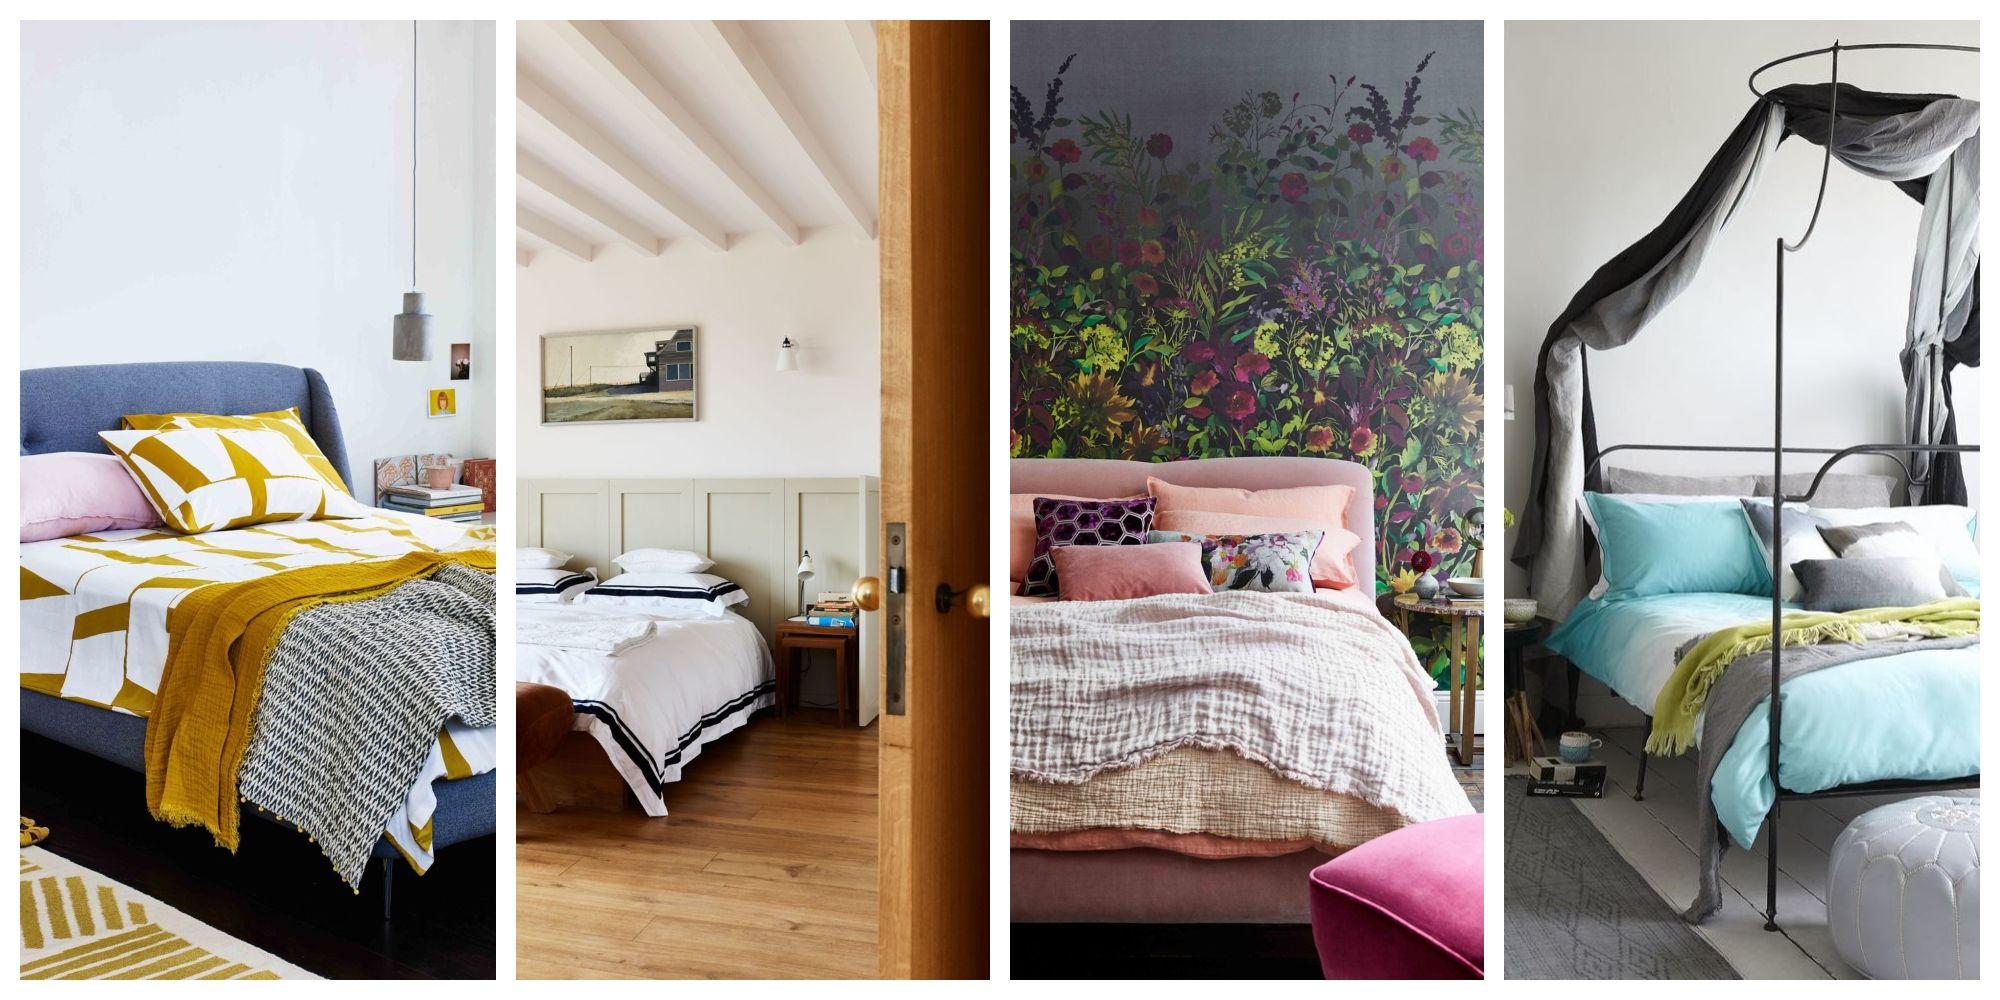 40 Beautiful Bedroom Decorating Ideas - Modern Bedroom Ideas on Beautiful Room Decoration  id=86097